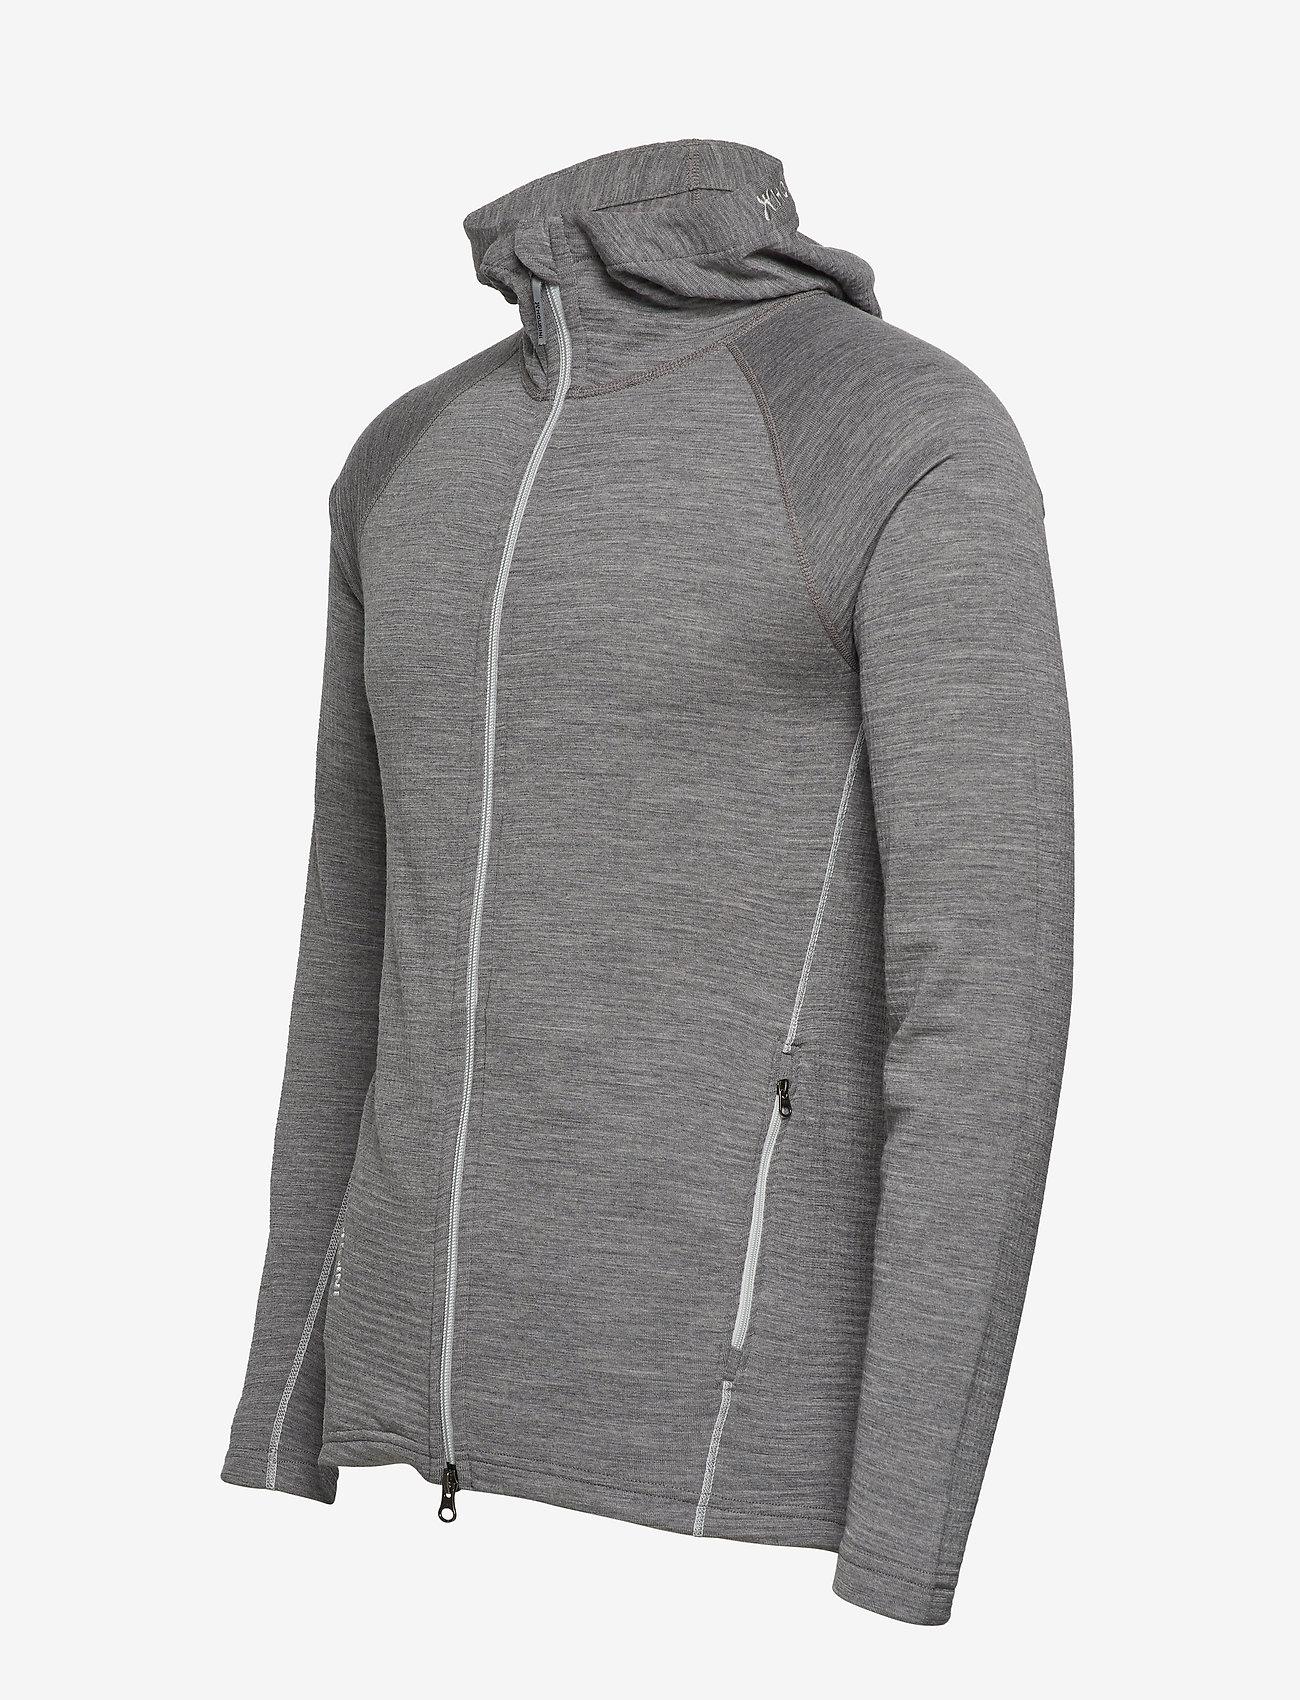 Houdini M's Wooler Houdi college grey S - Sweatshirts COLLEGE GREY - Menn Klær